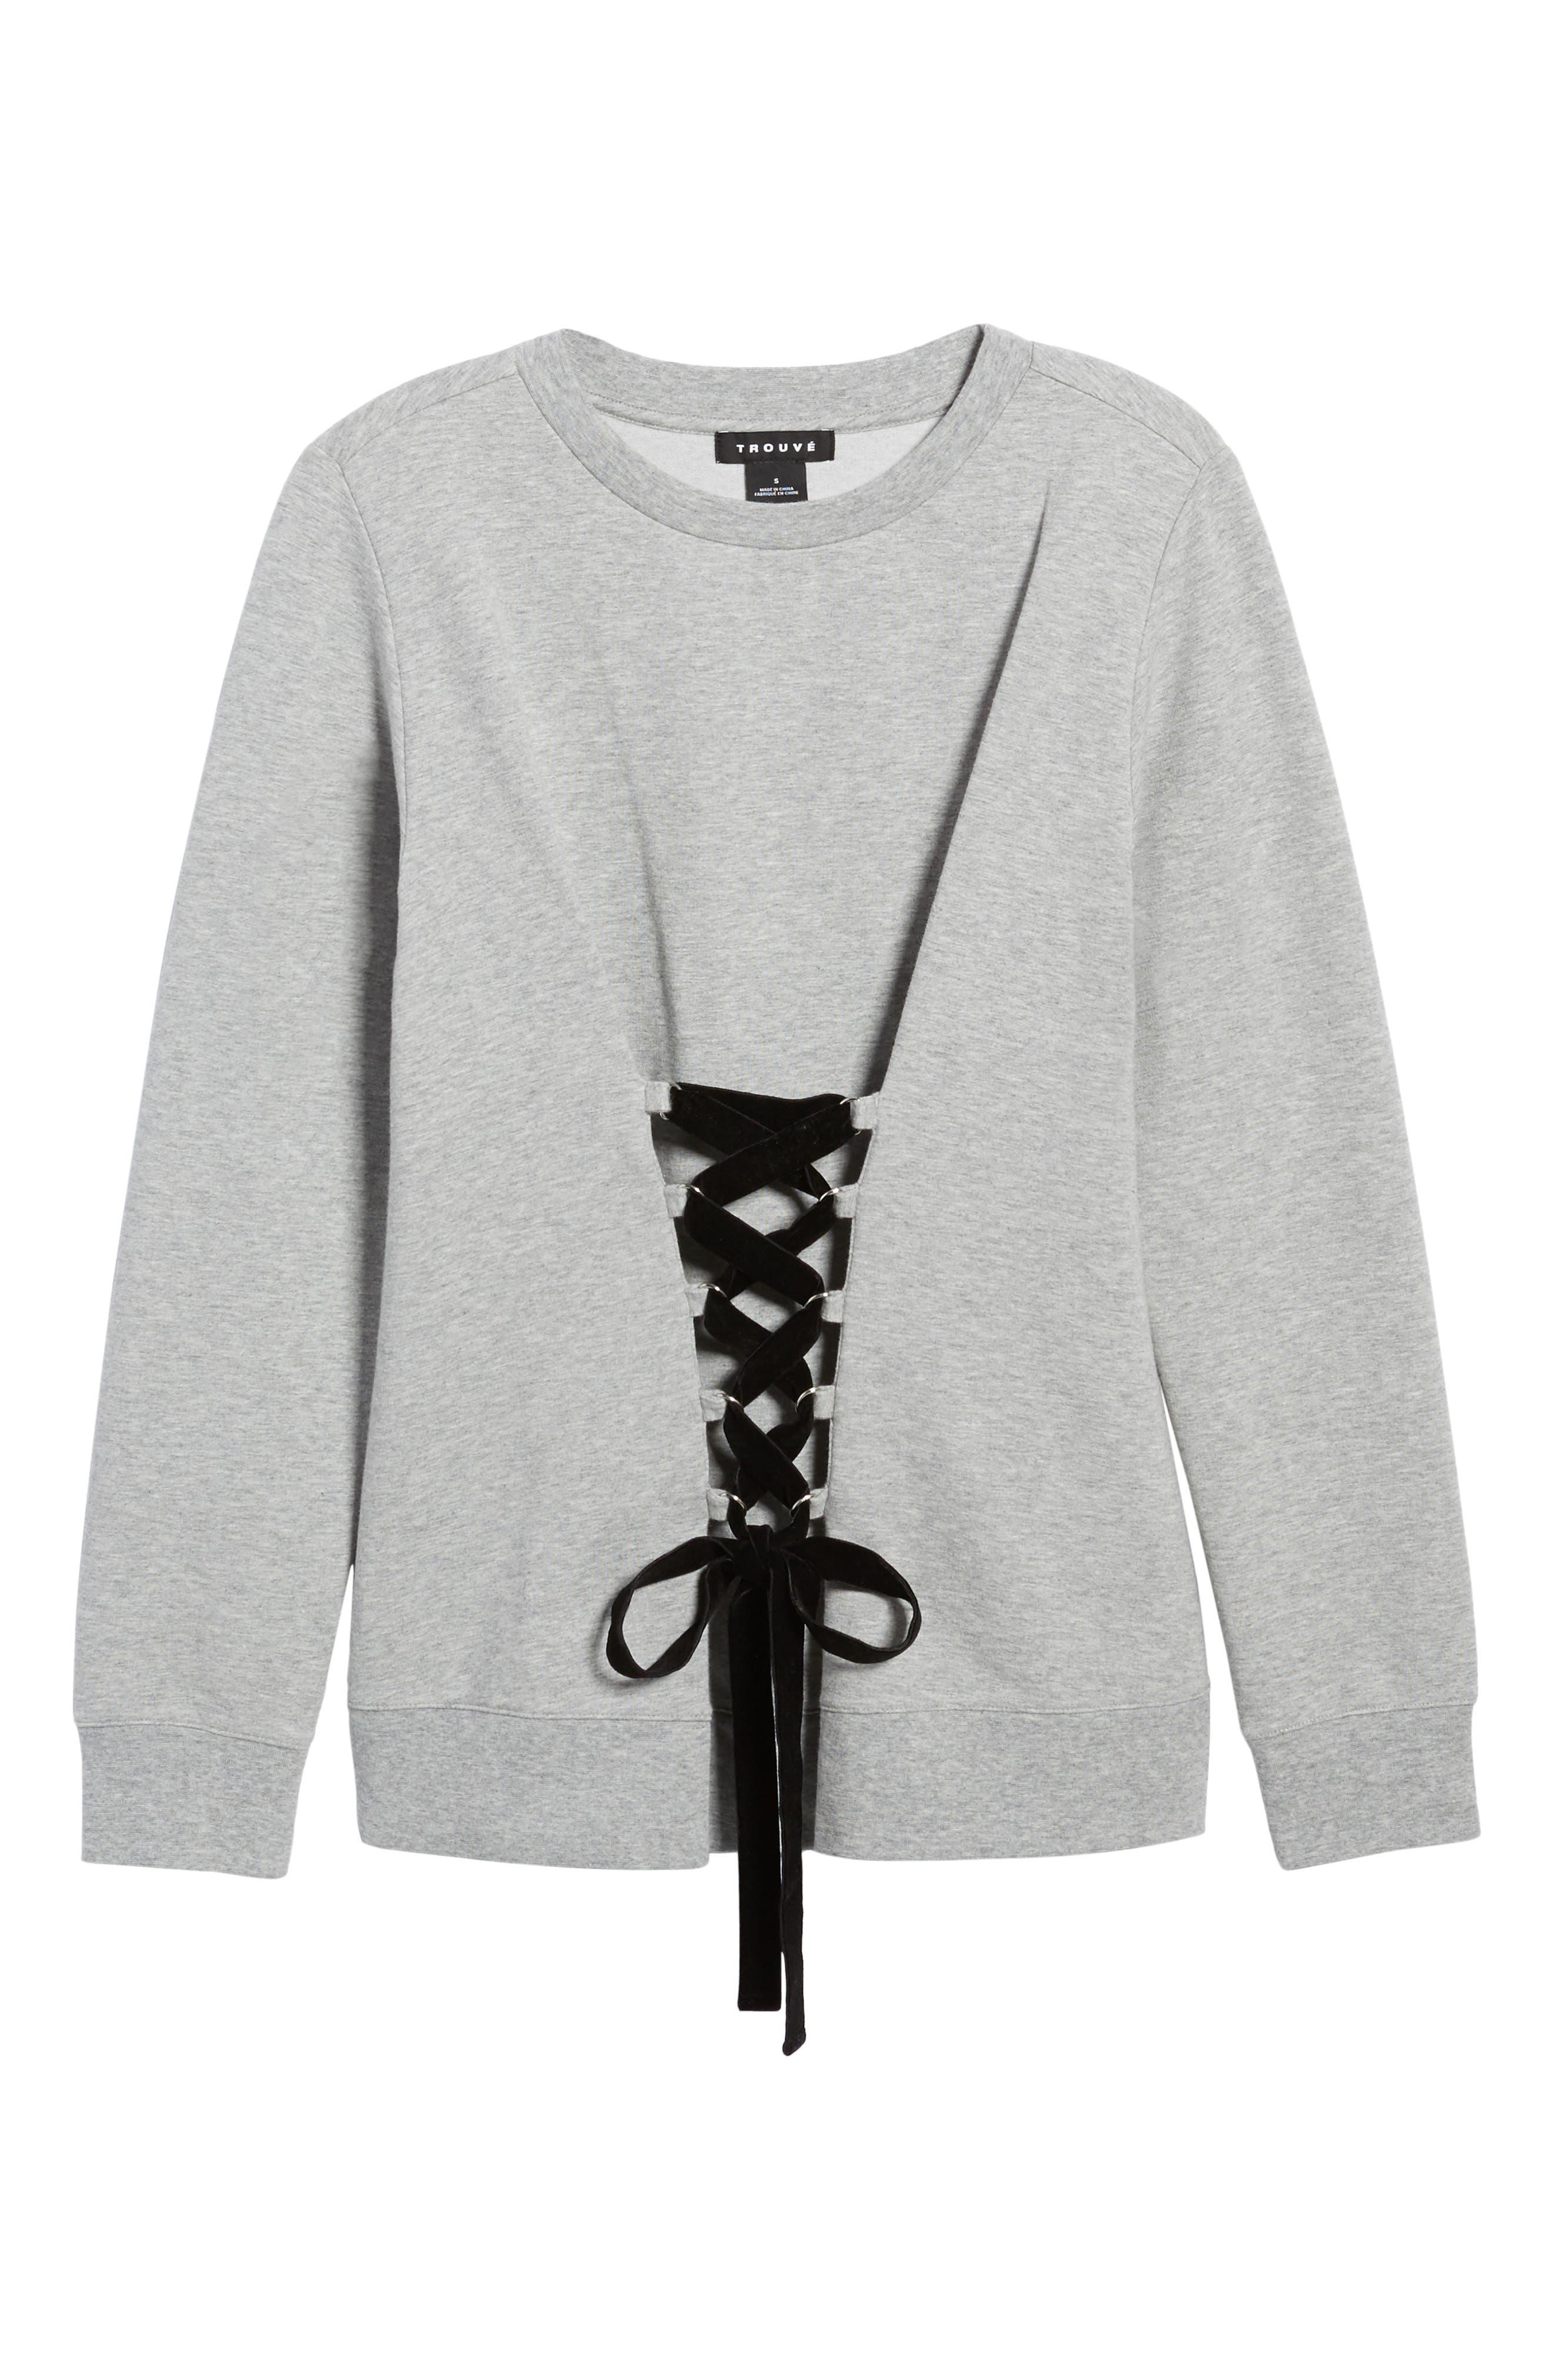 Lace-Up Sweatshirt,                             Alternate thumbnail 6, color,                             Grey Heather